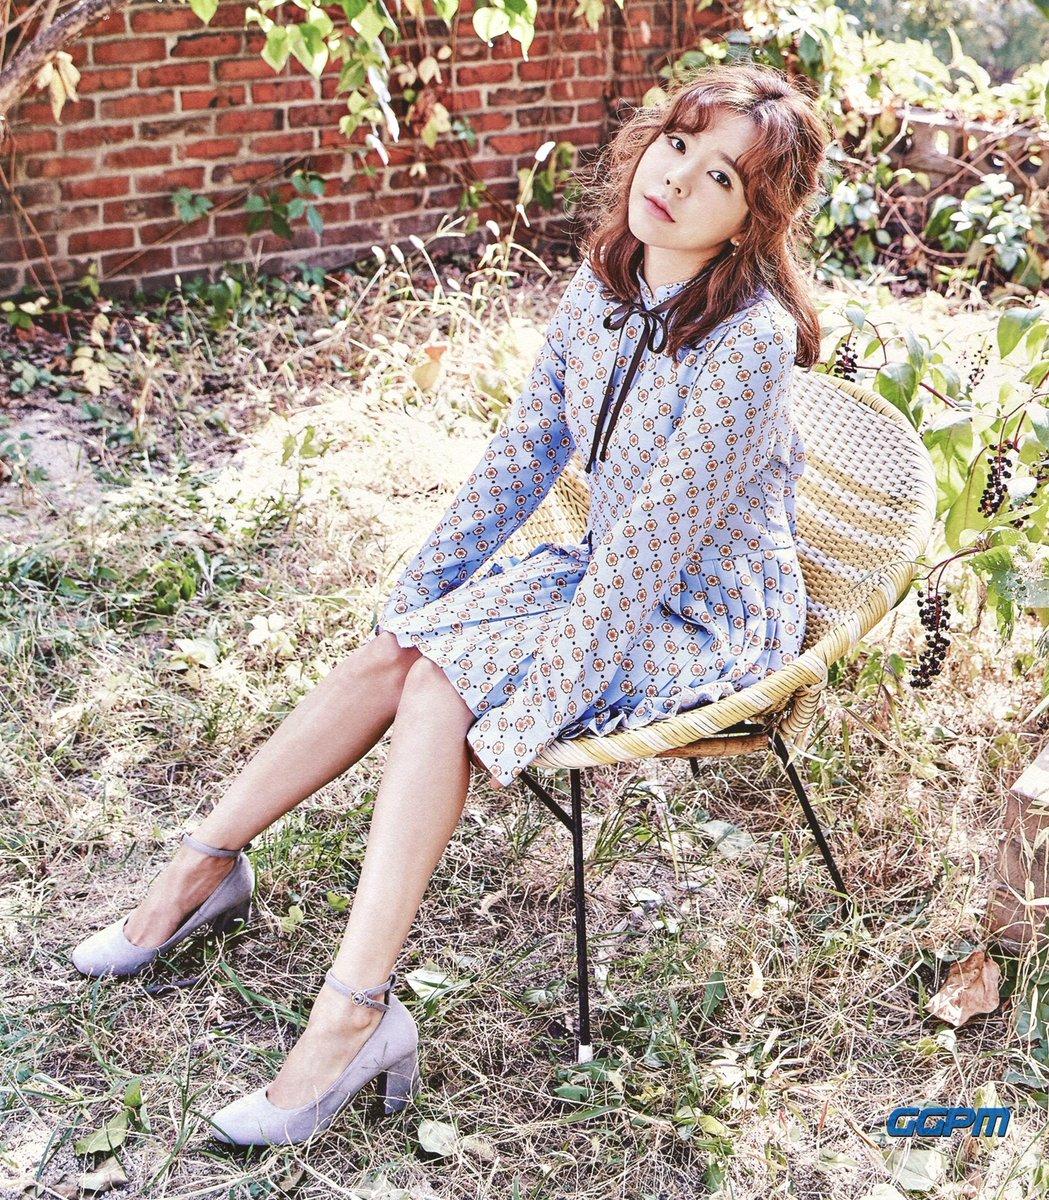 Sunny 2017 SEASON'S GREETINGS 'Ordinary Days'